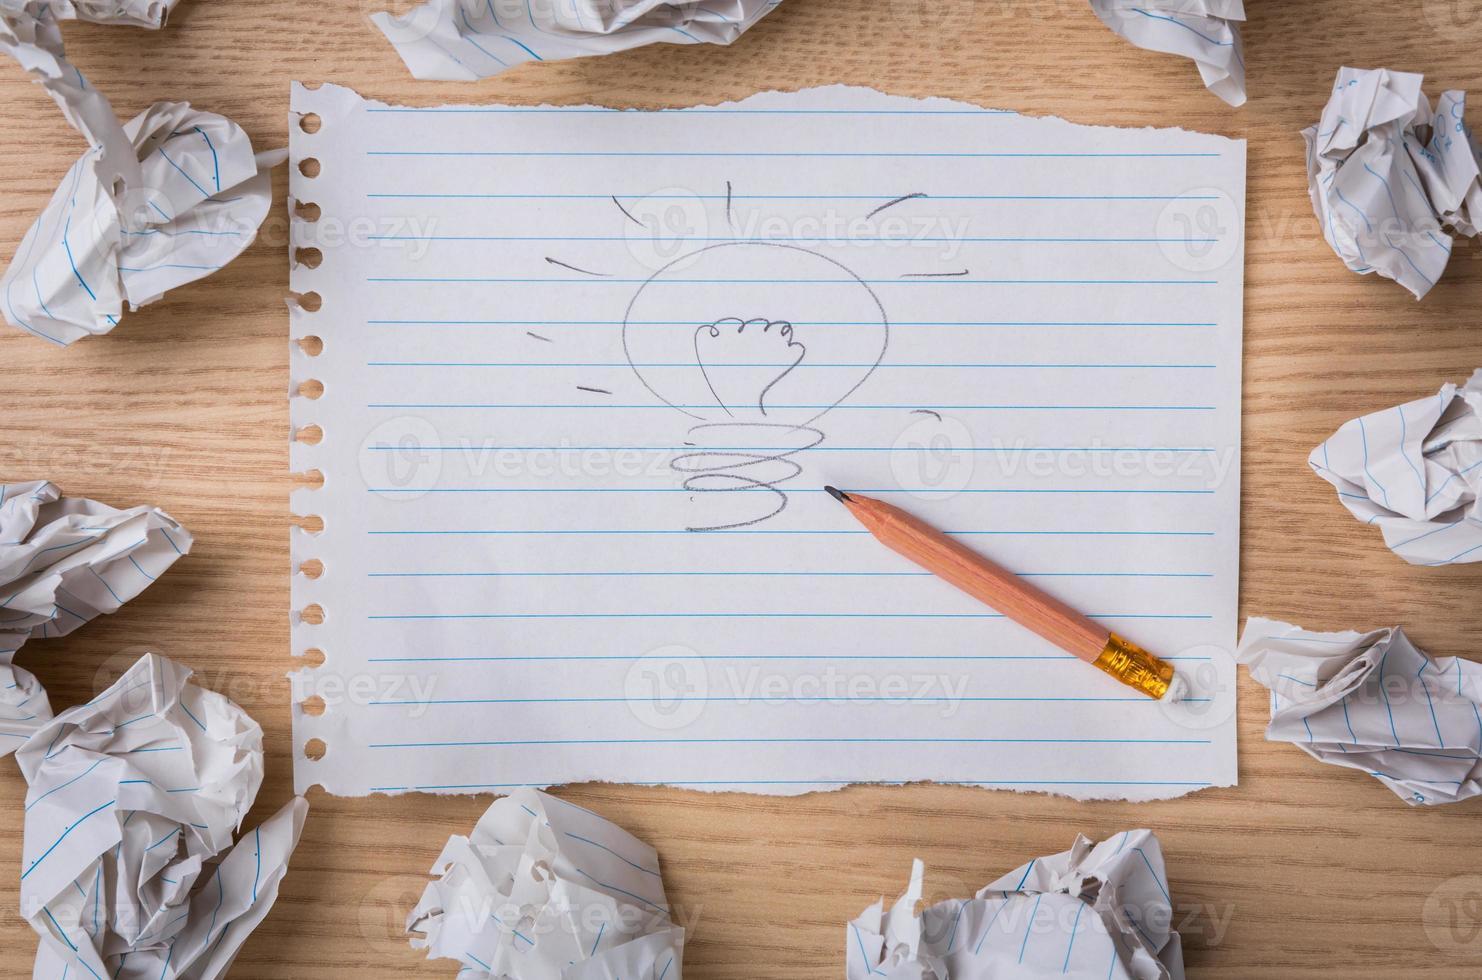 bombilla dibujada a mano sobre papel con lápiz foto